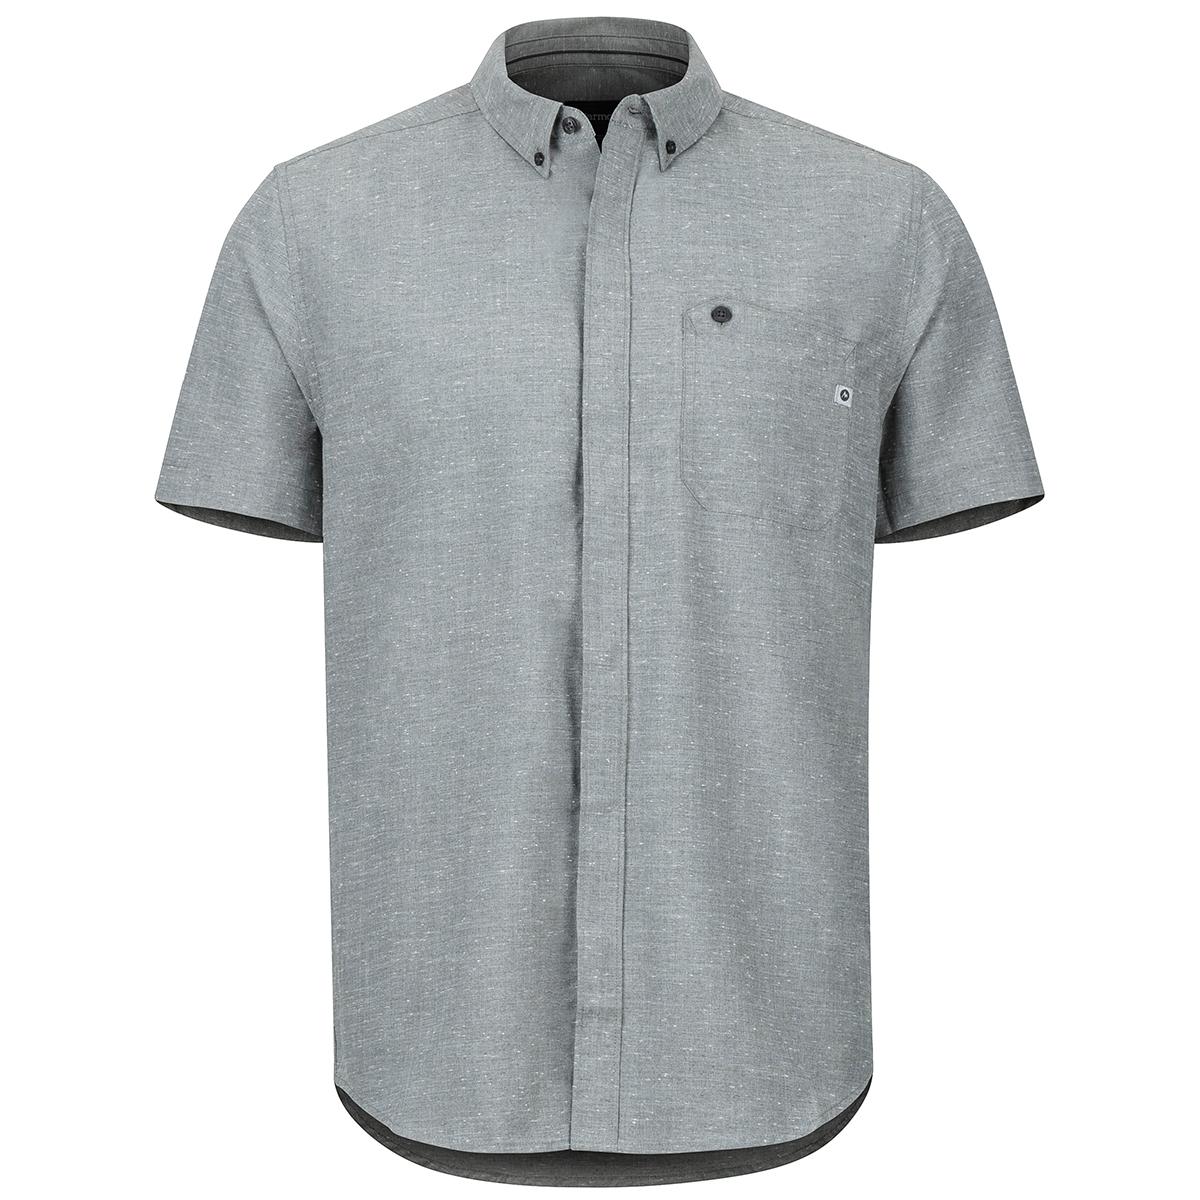 Marmot Men's Cooper Canyon Short-Sleeve Shirt - Black, XL